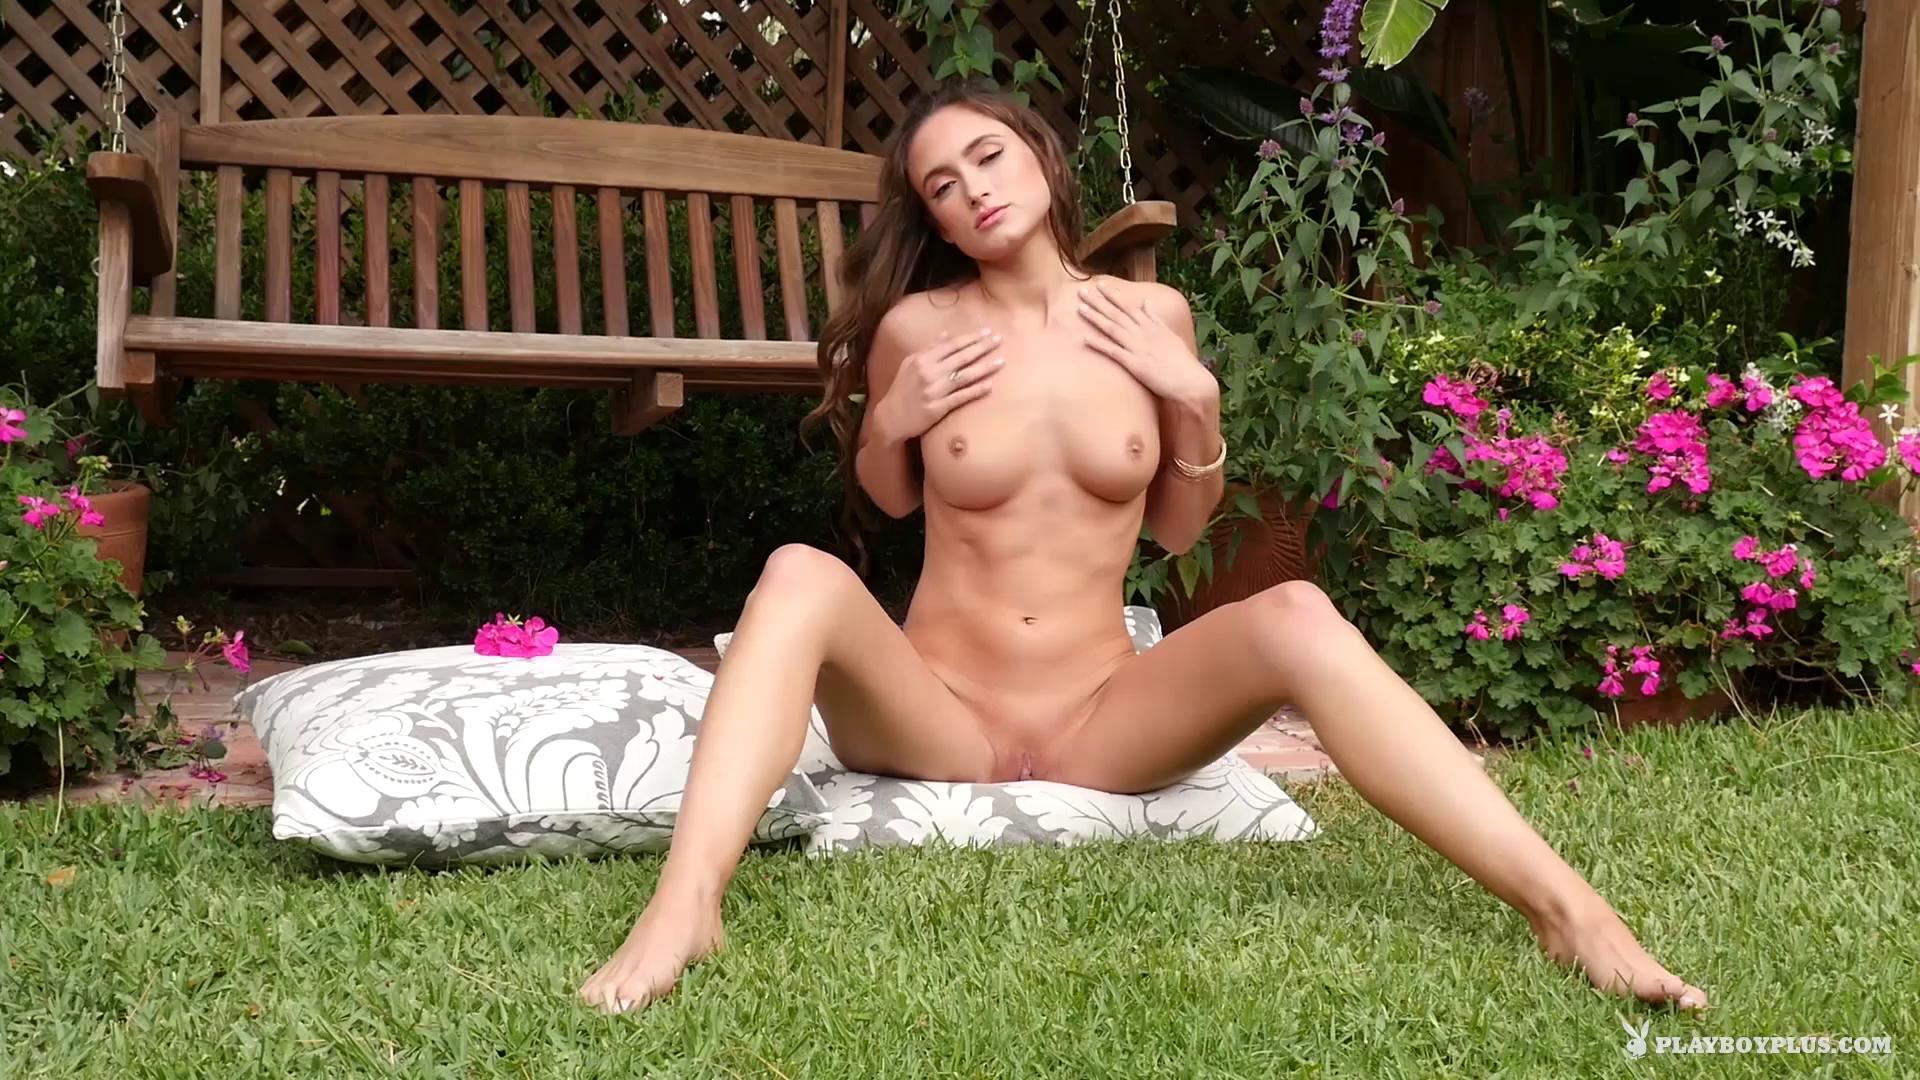 PlayboyPlus – Deanna Greene Candy Land